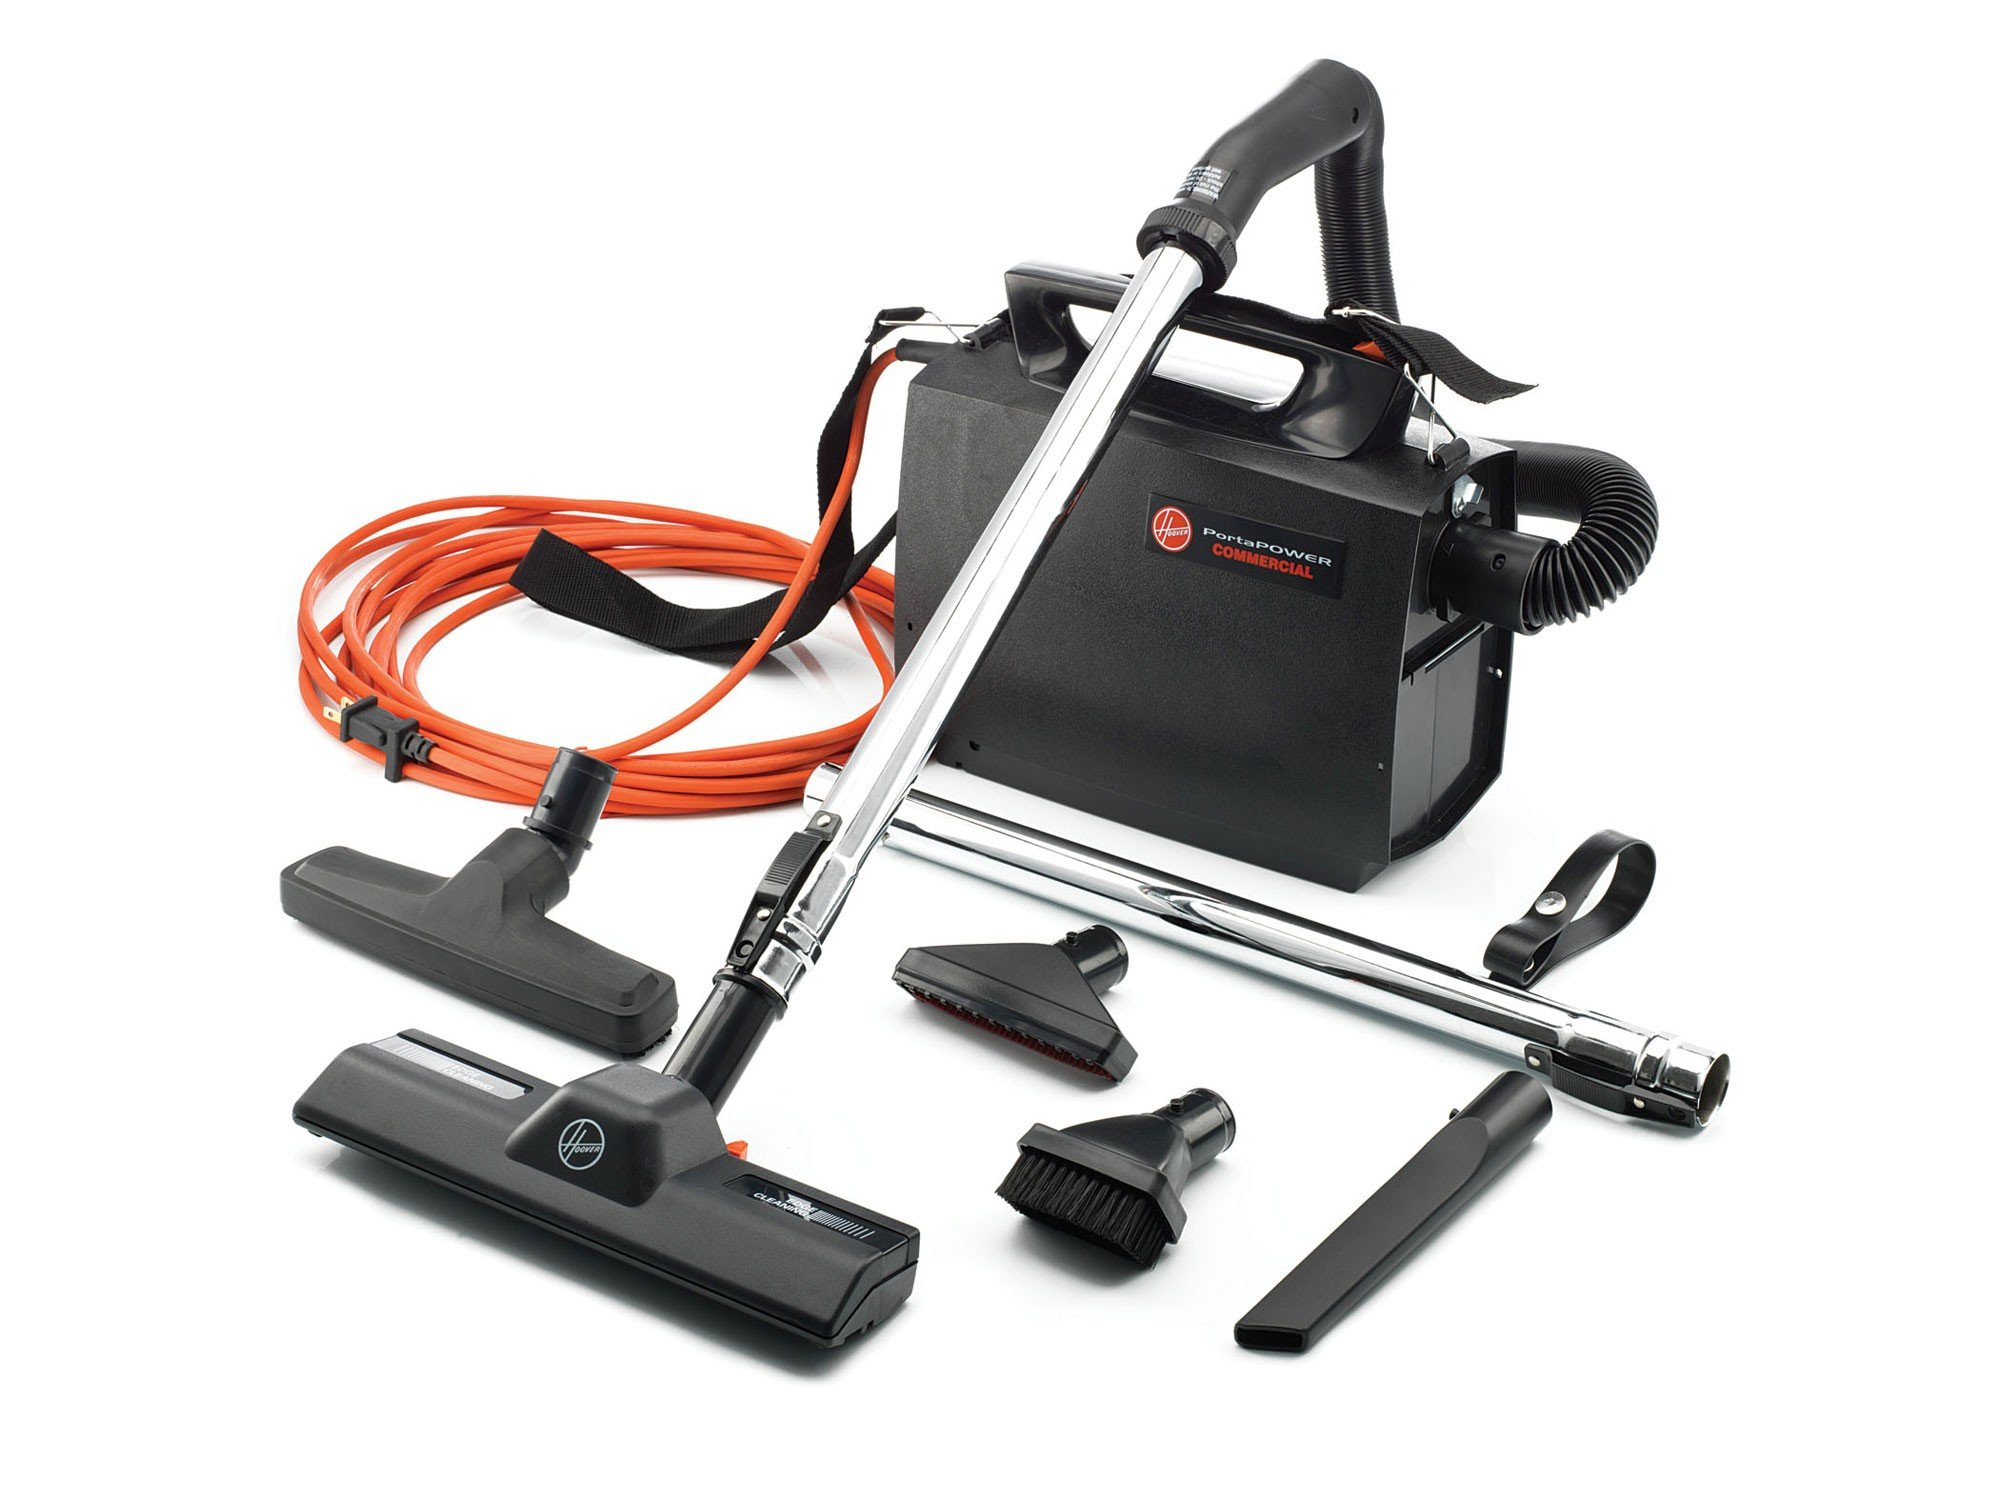 Hoover PortaPower Lightweight Vacuum - Part No. CH30000